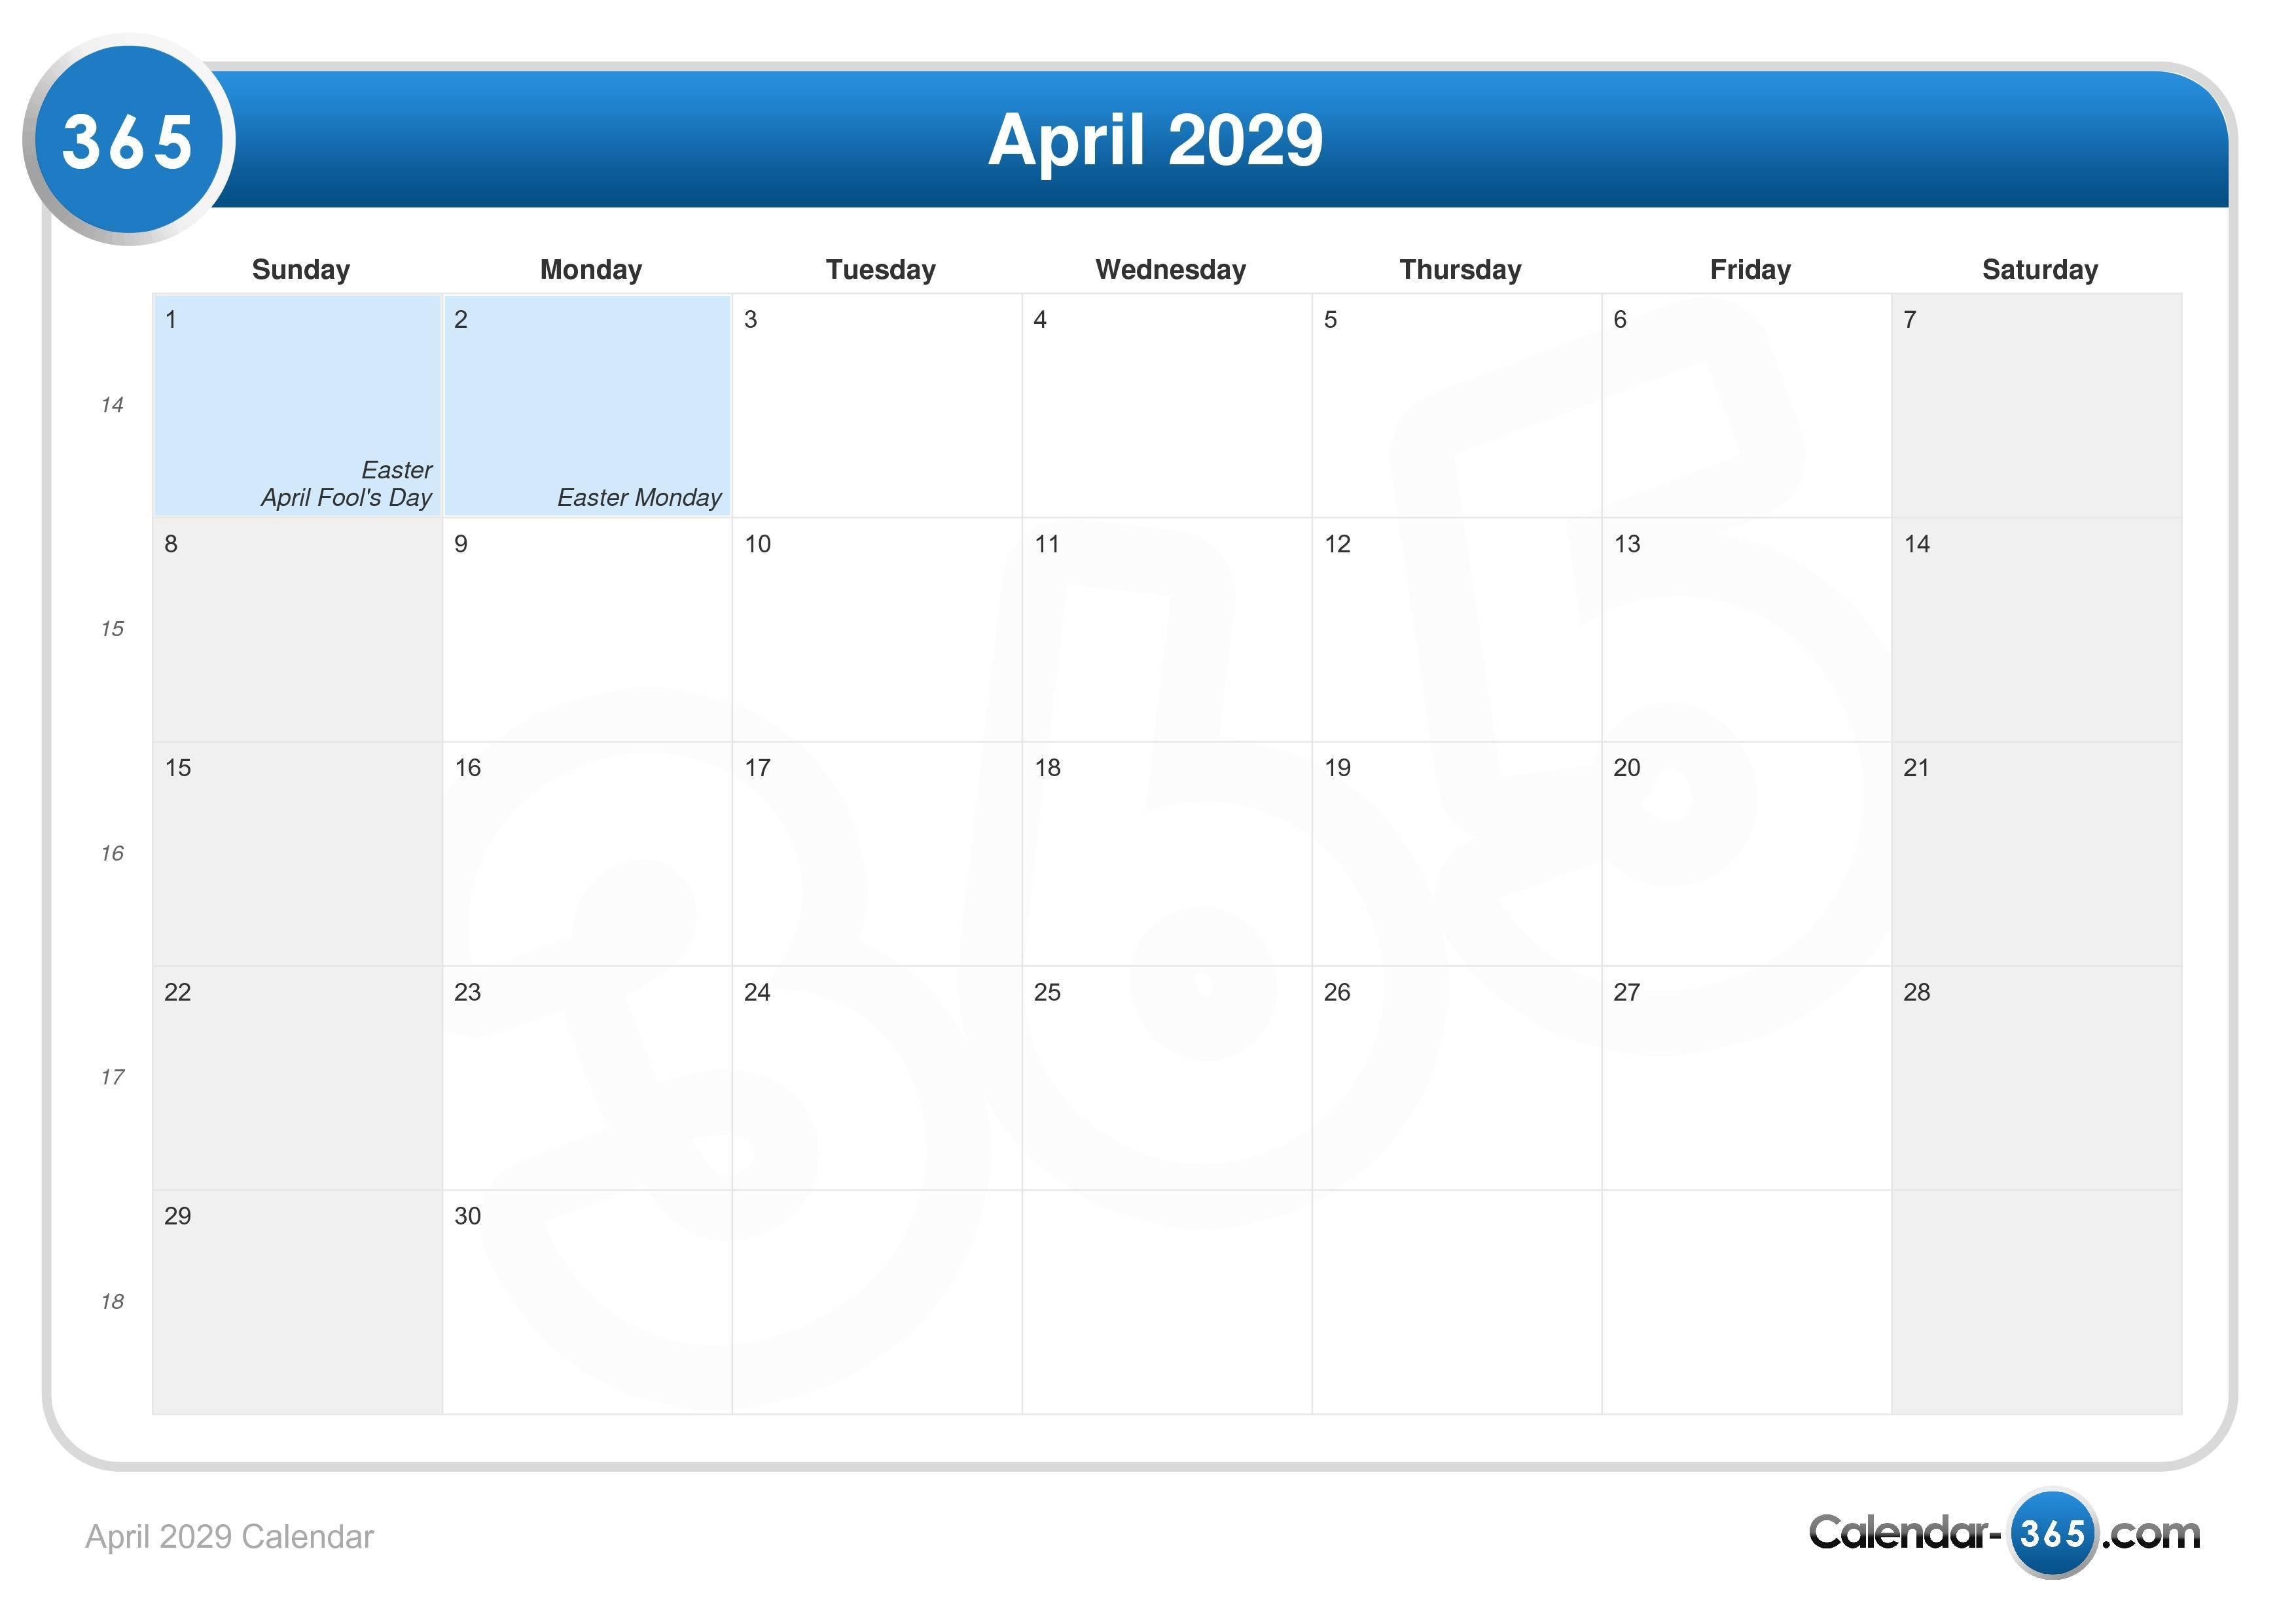 April 2029 Calendar